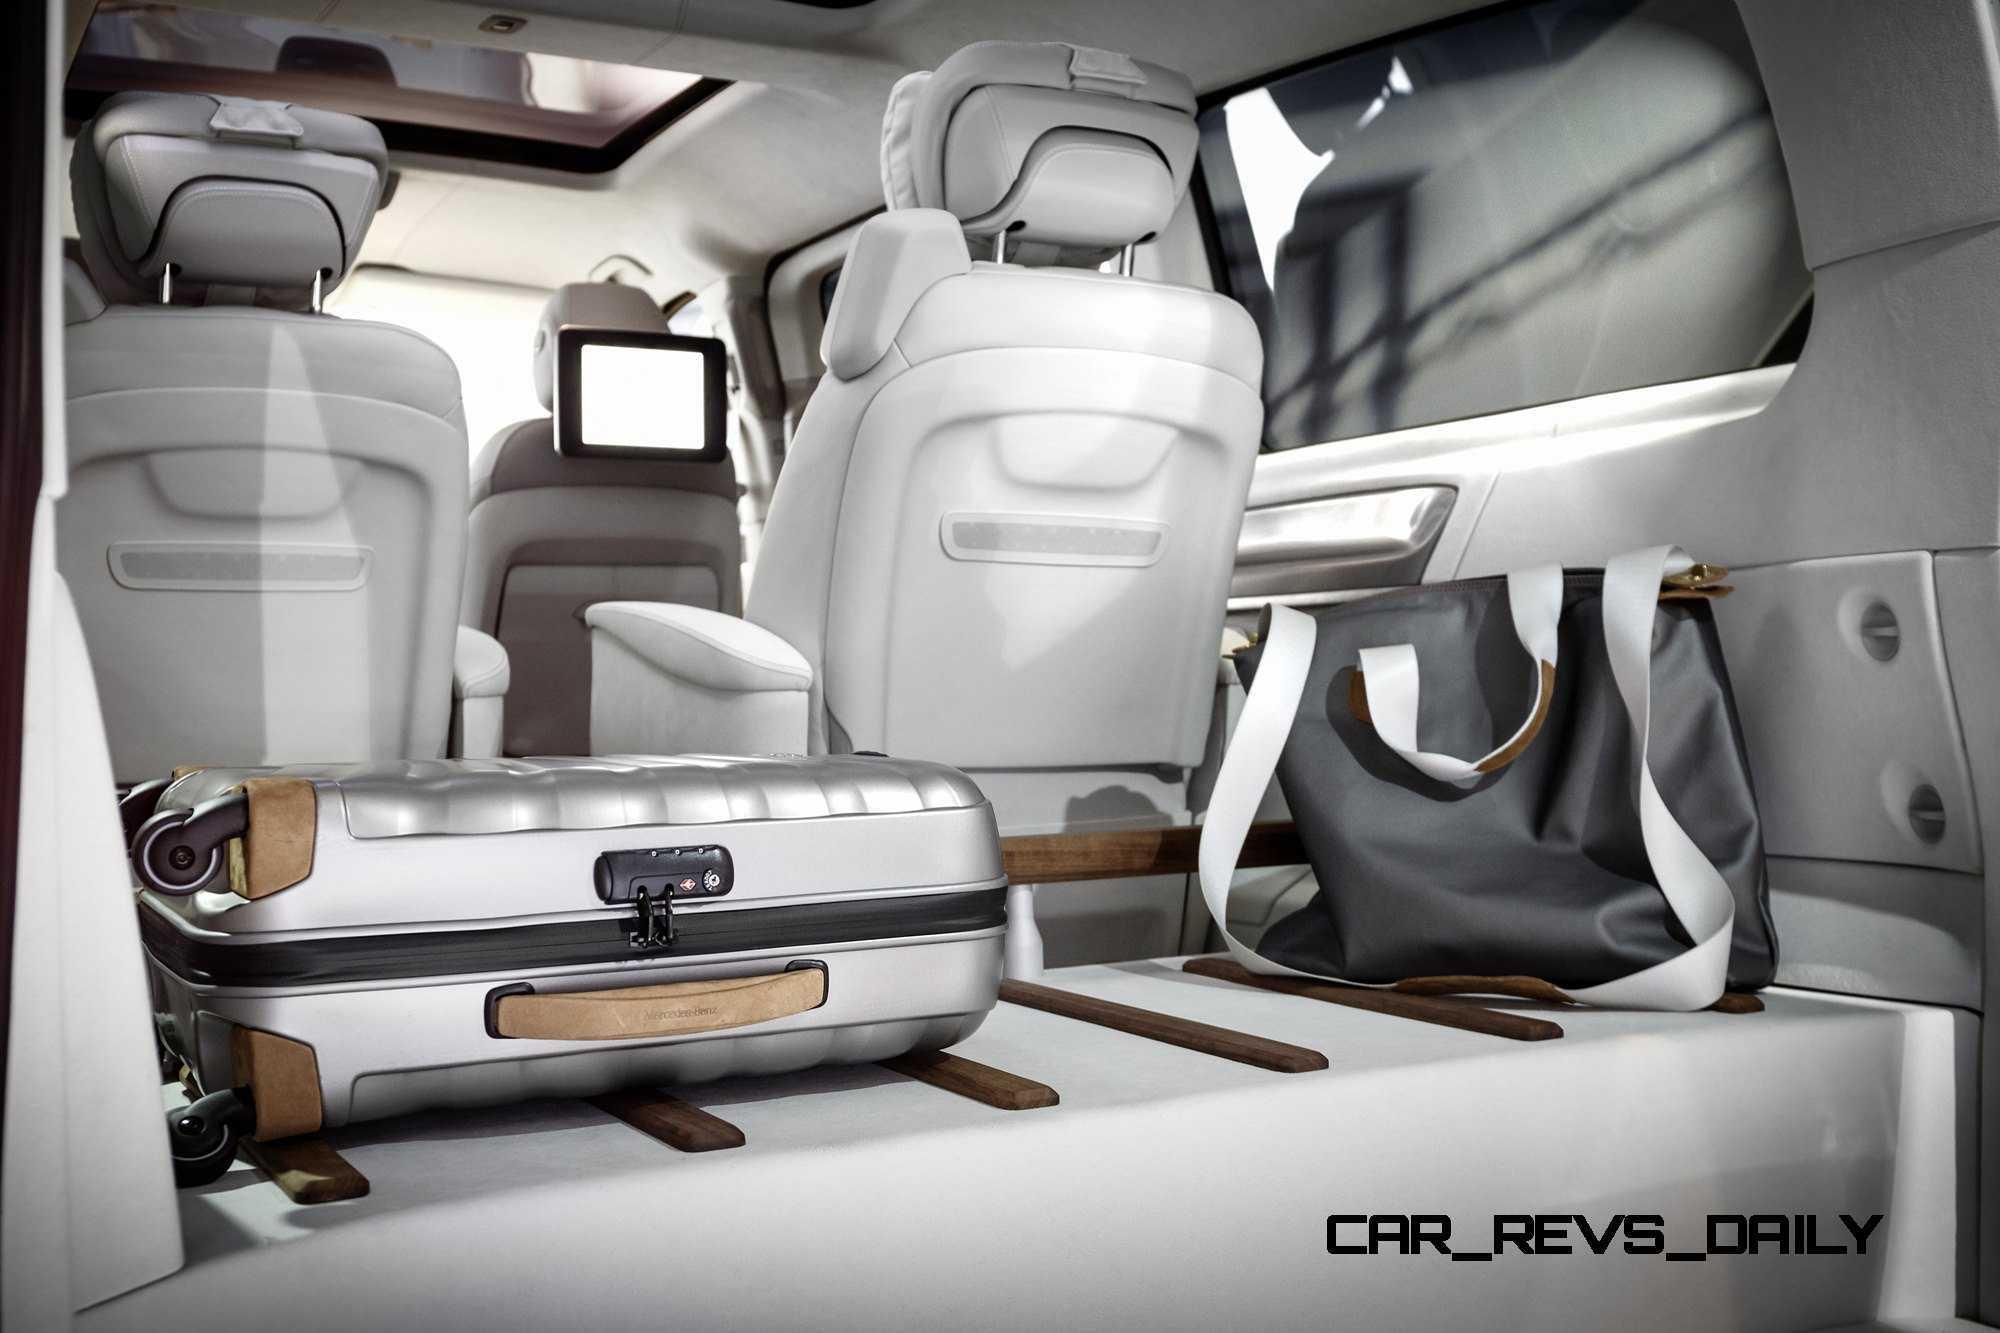 mercedes class photos benz minivan caradvice v revealed